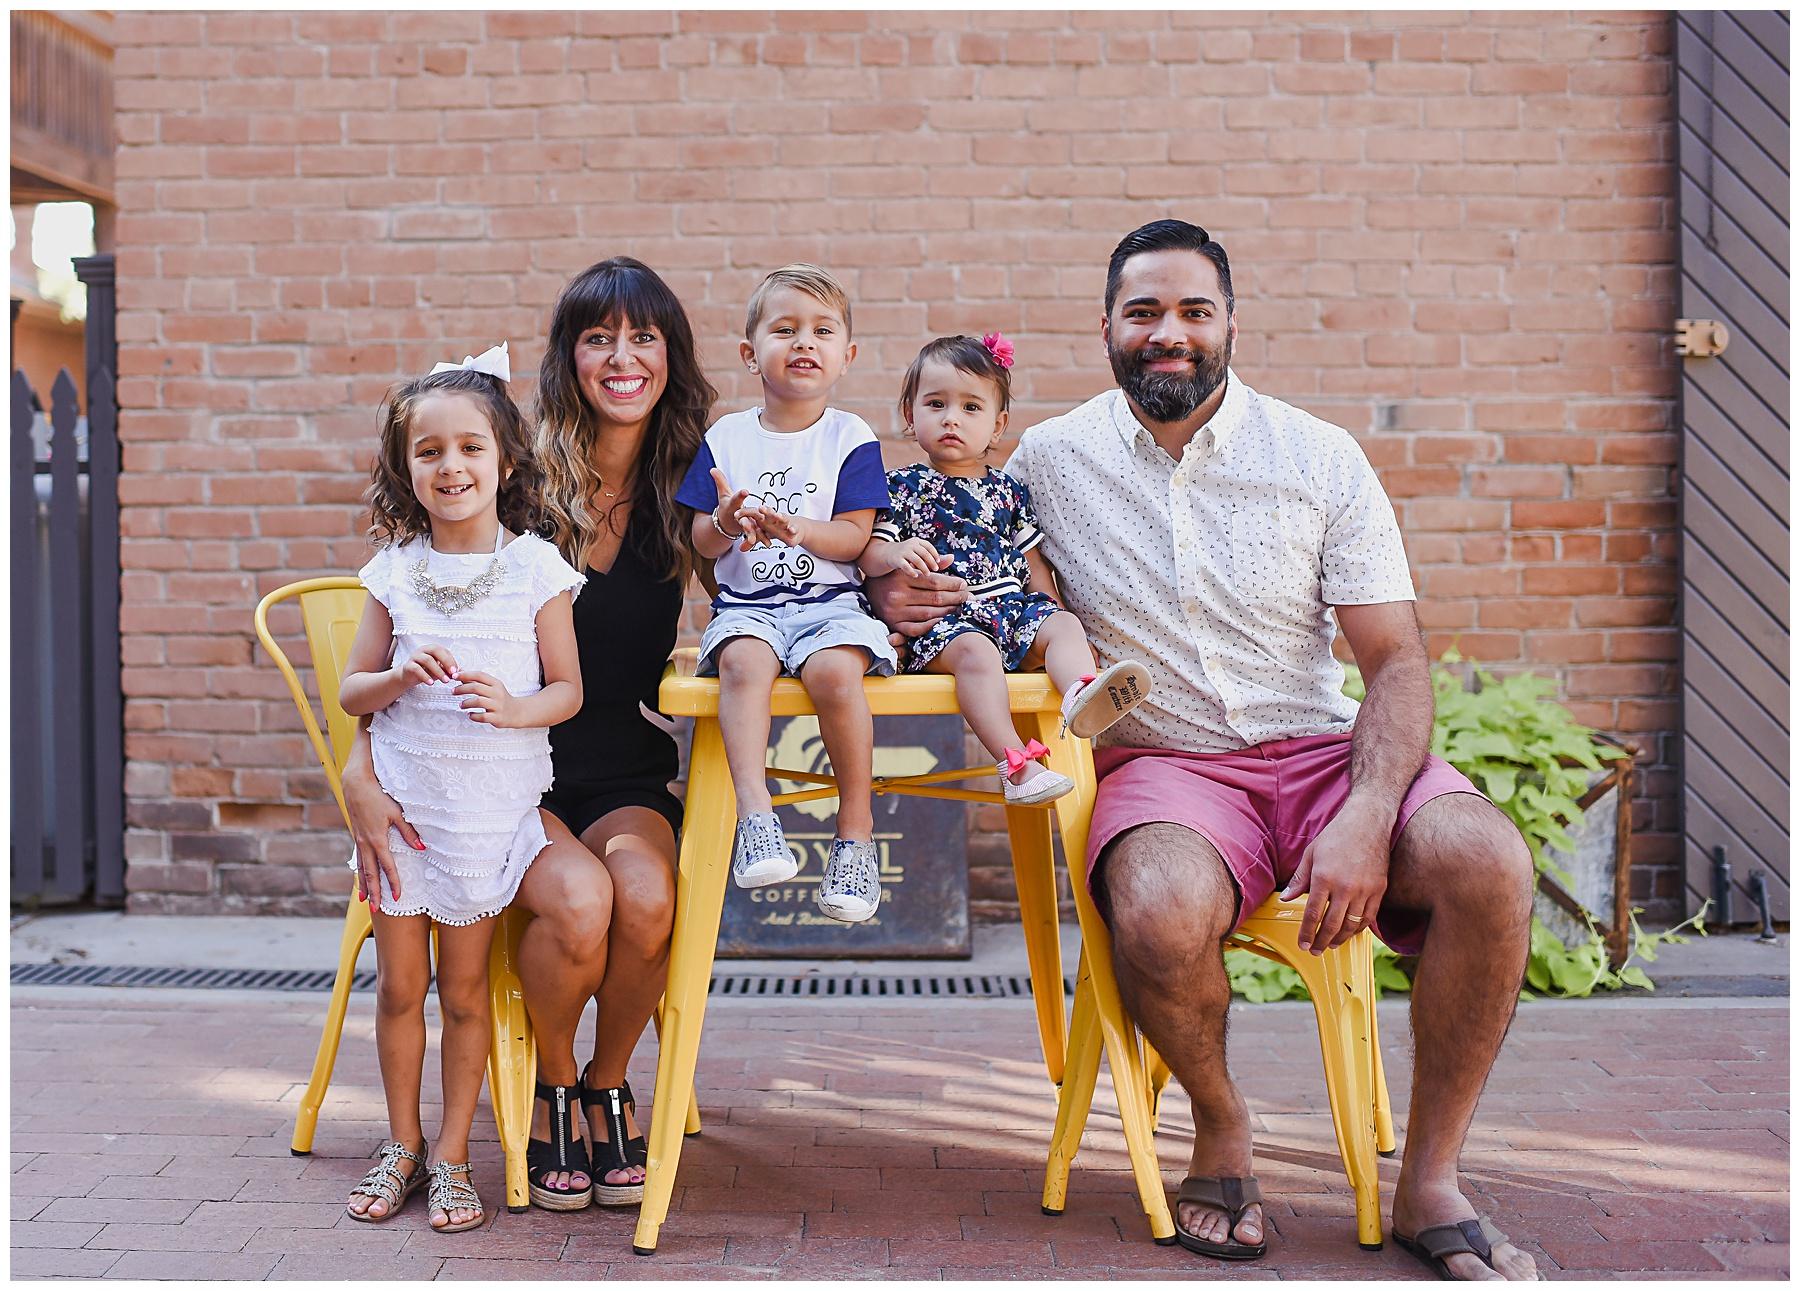 Urban family portrait session in Phoenix AZ   SweetLife Photography